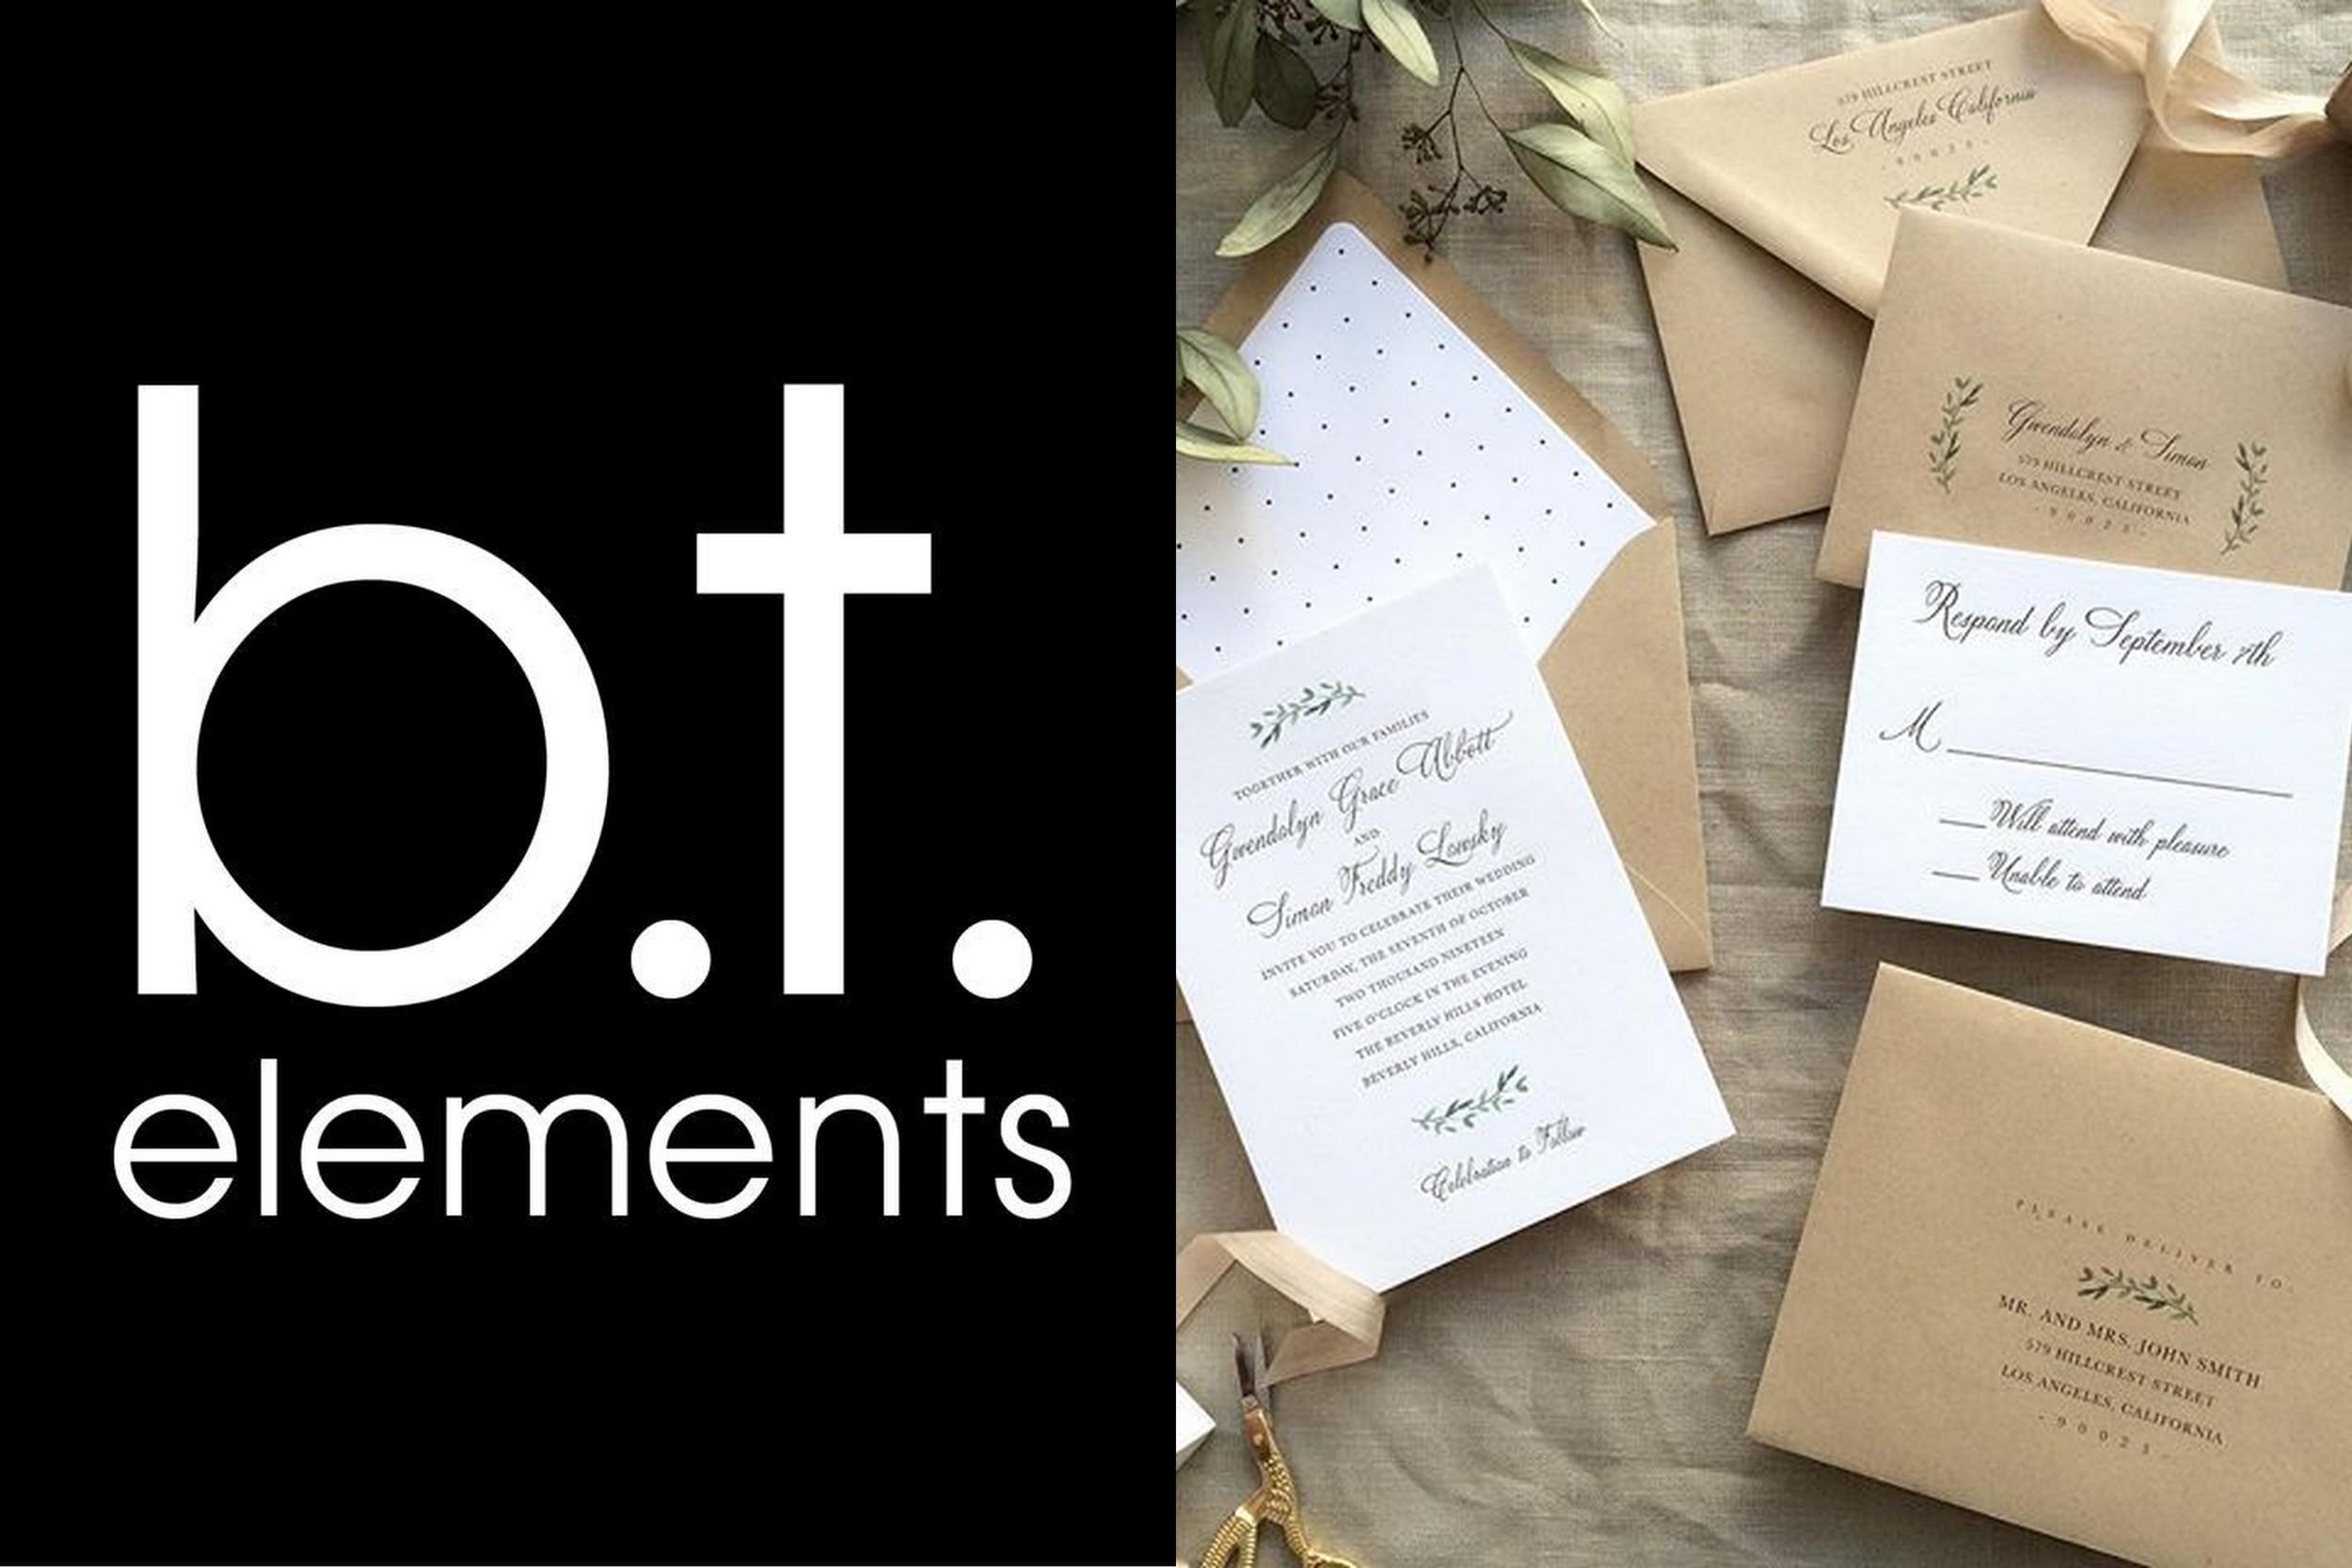 b.t. elements